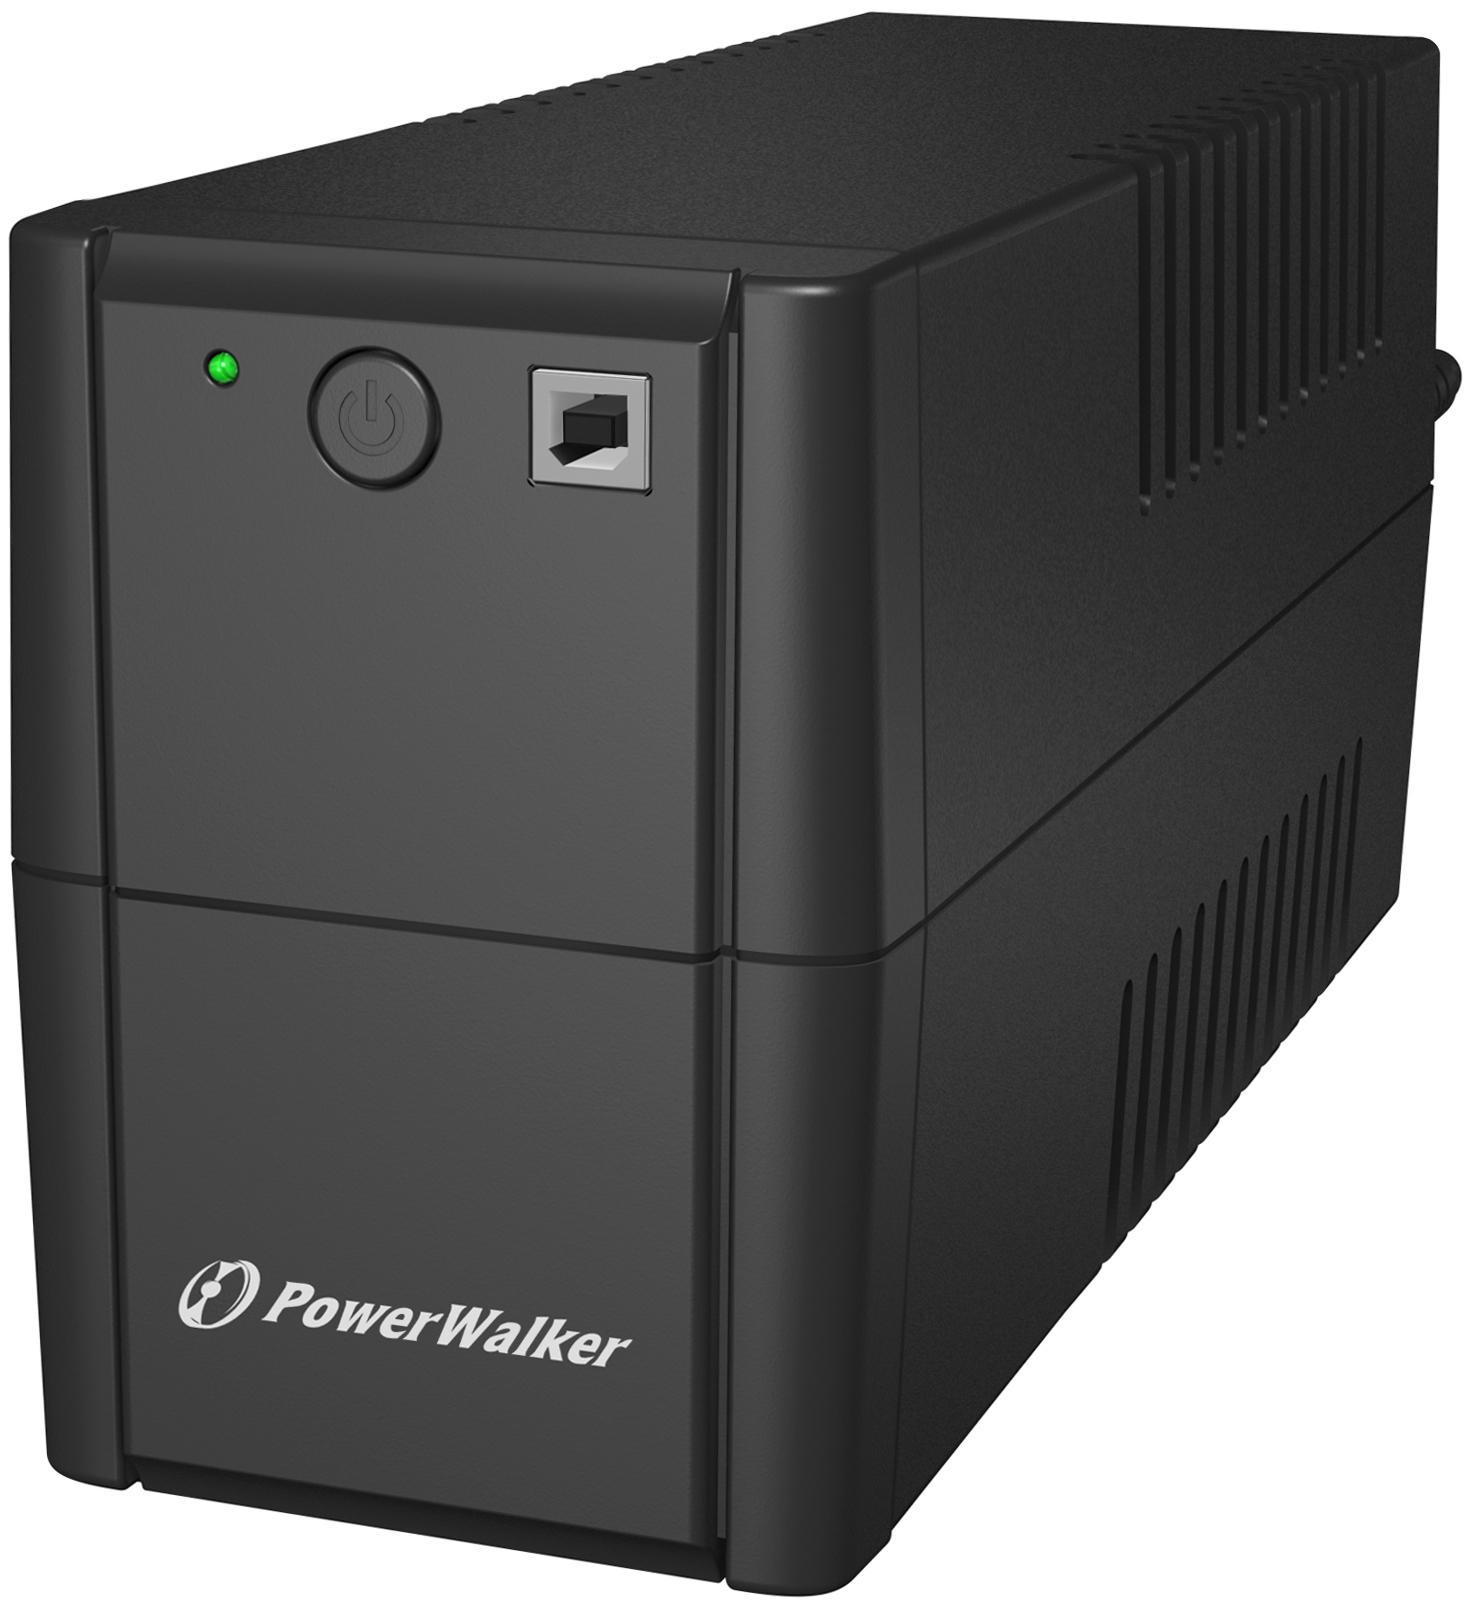 PowerWalker VI 650 SE Line-Interactive 0.65 kVA 360 W 2 AC outlet(s)